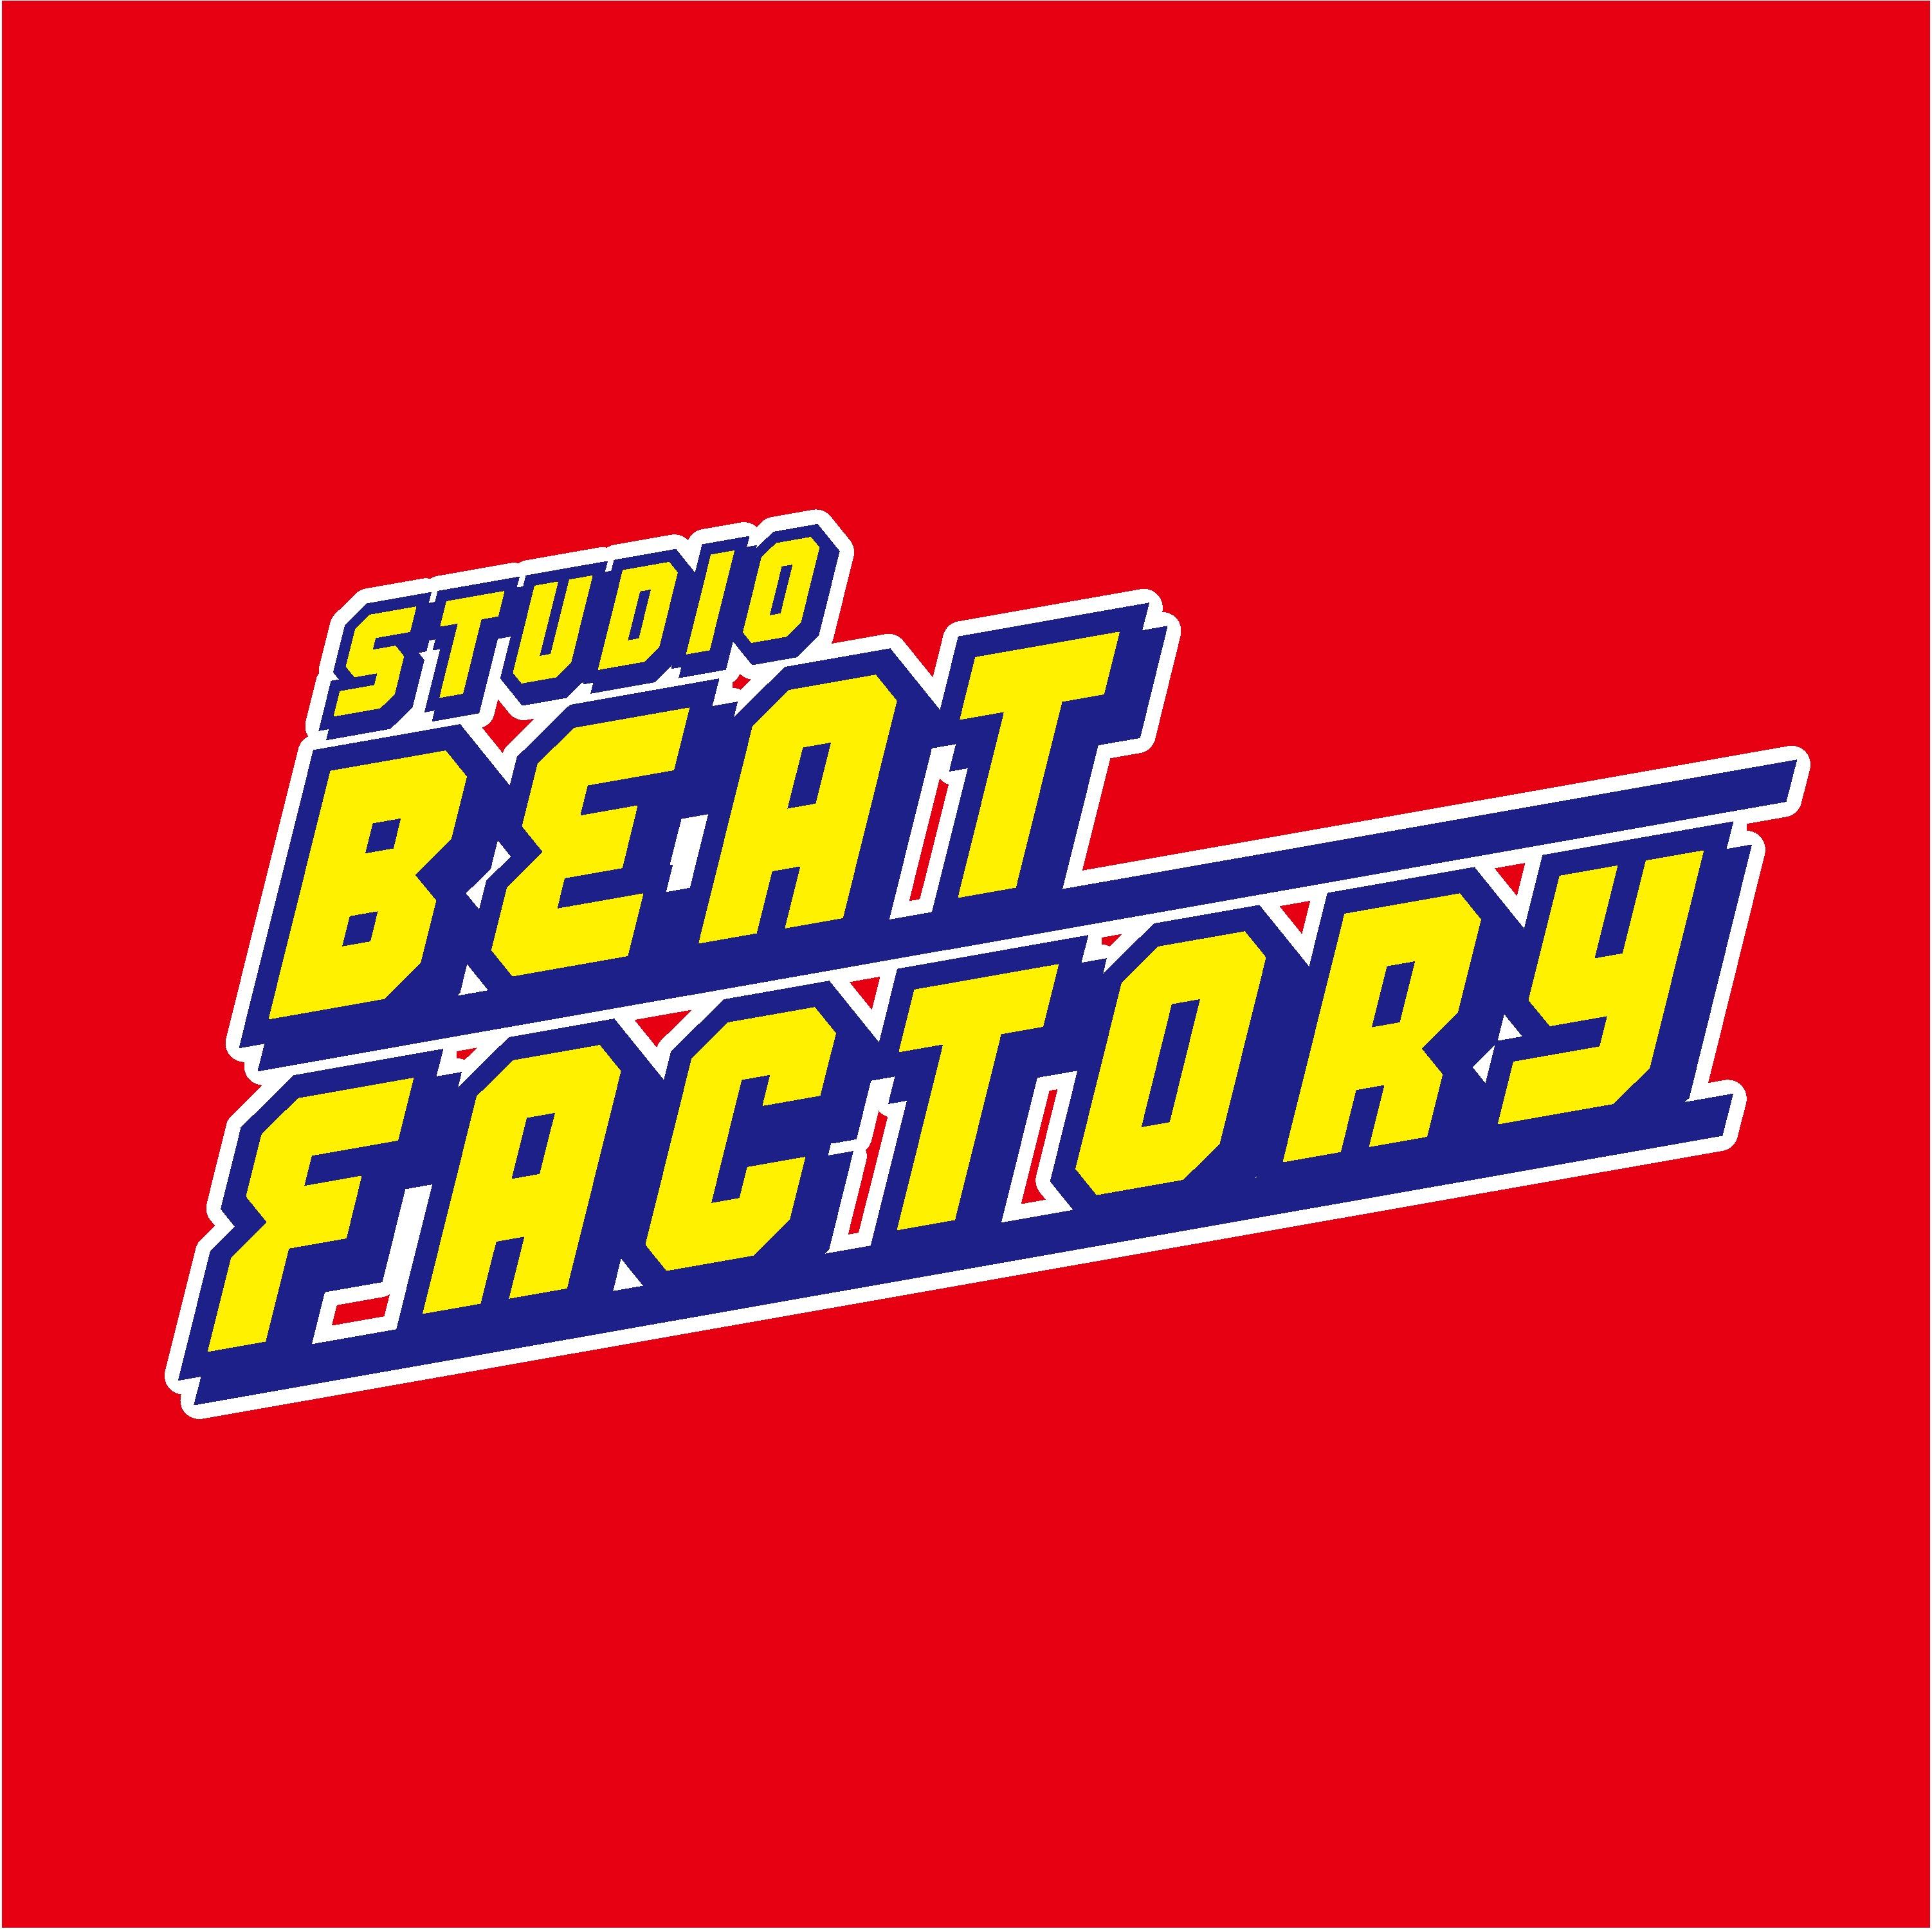 Studio BEAT  FACTORY